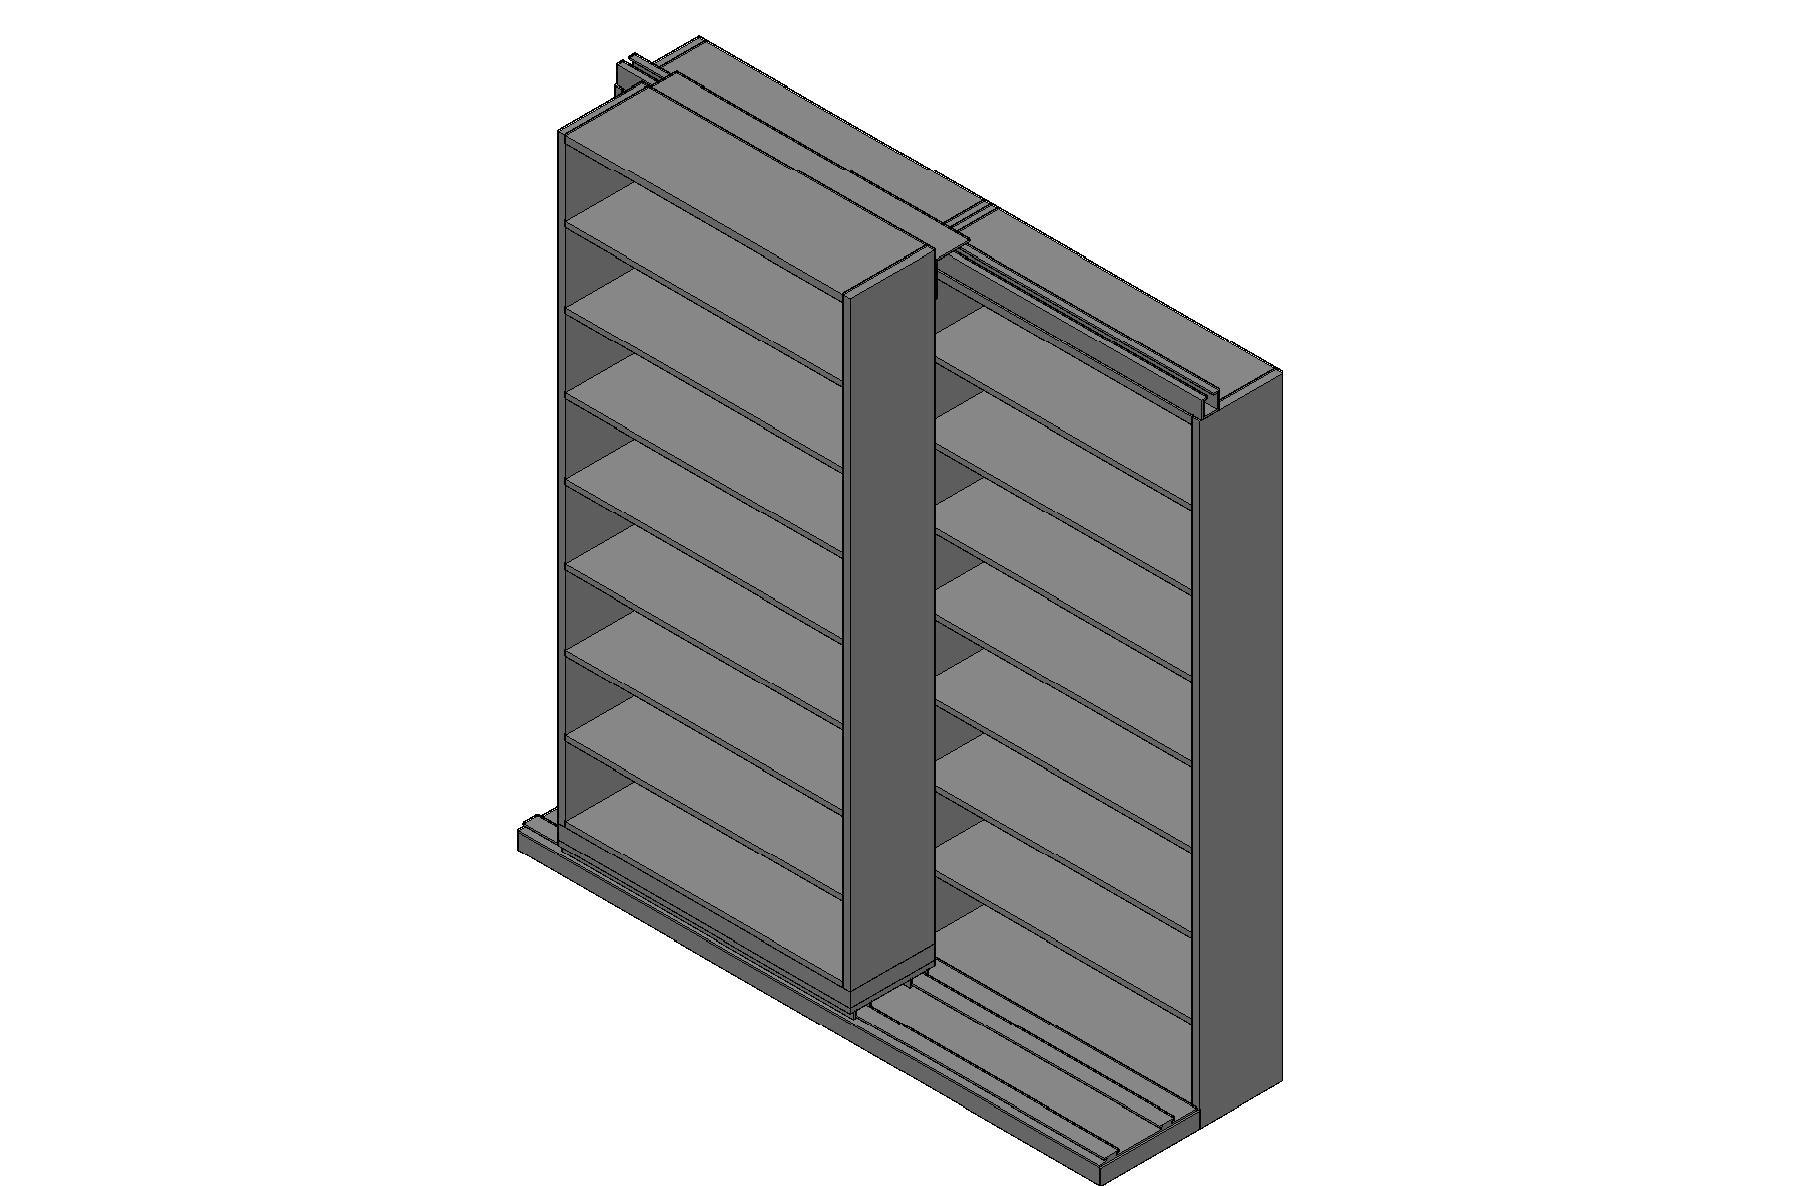 "Letter Size Sliding Shelves - 2 Rows Deep - 8 Levels - (42"" x 12"" Shelves) - 88"" Total Width"